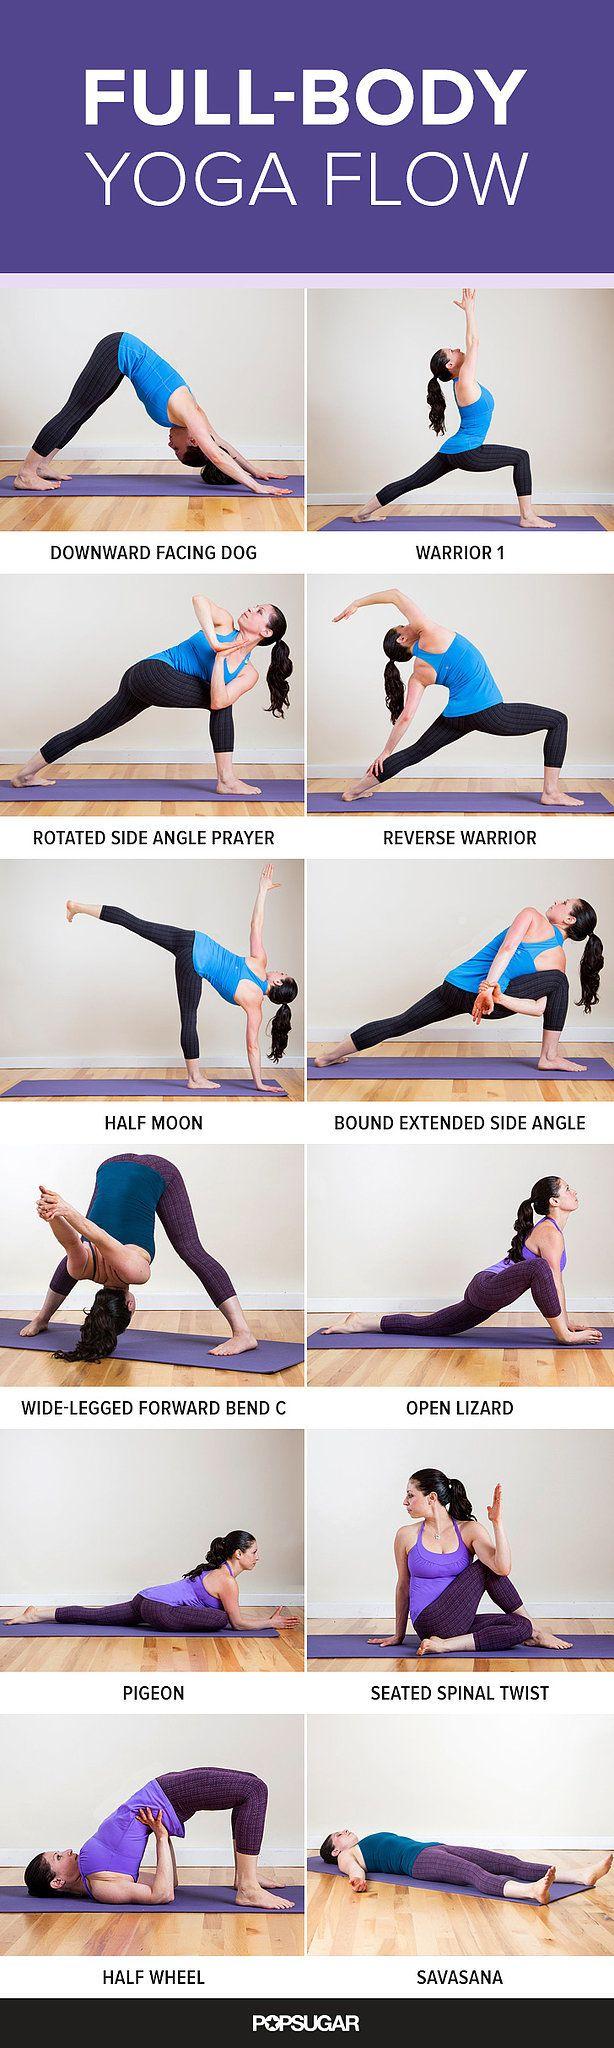 Yoga Soccer Poses Players